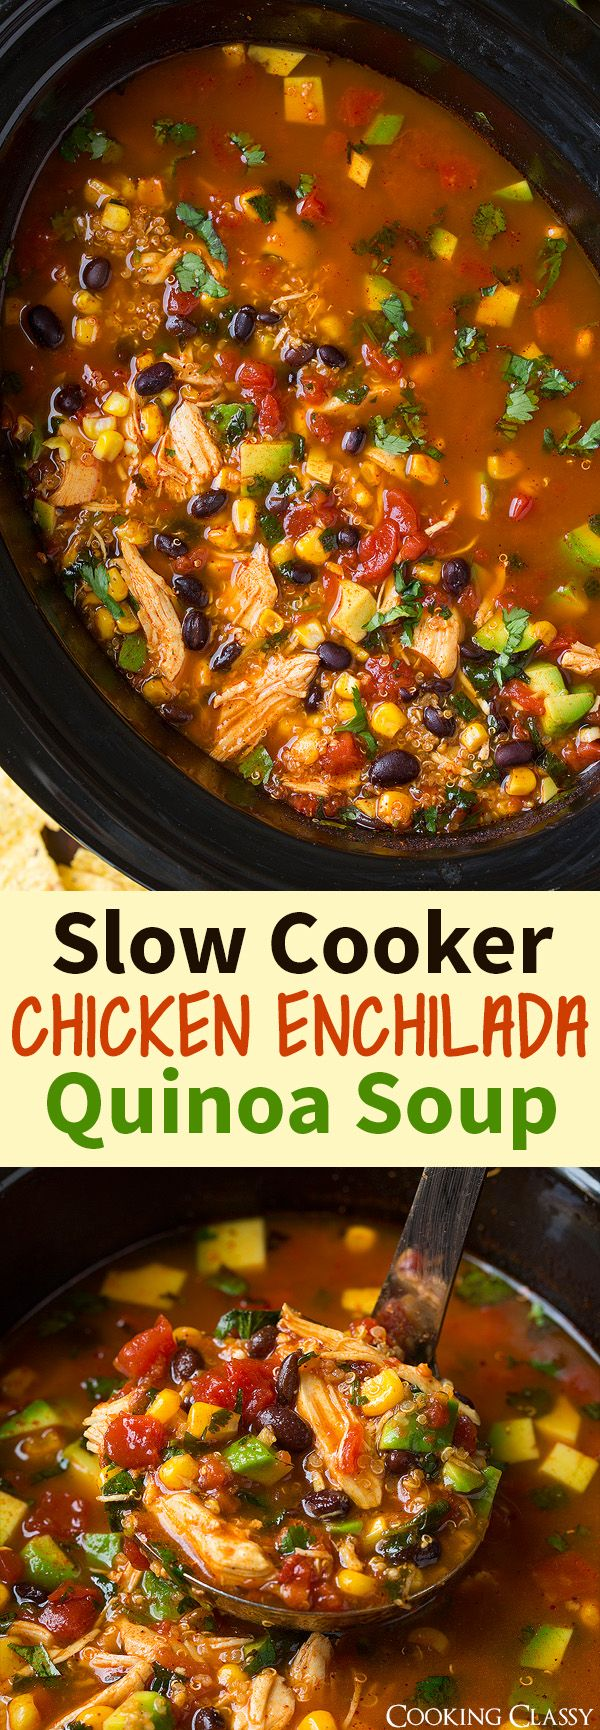 Slow Cooker Chicken Enchilada Quinoa Soup